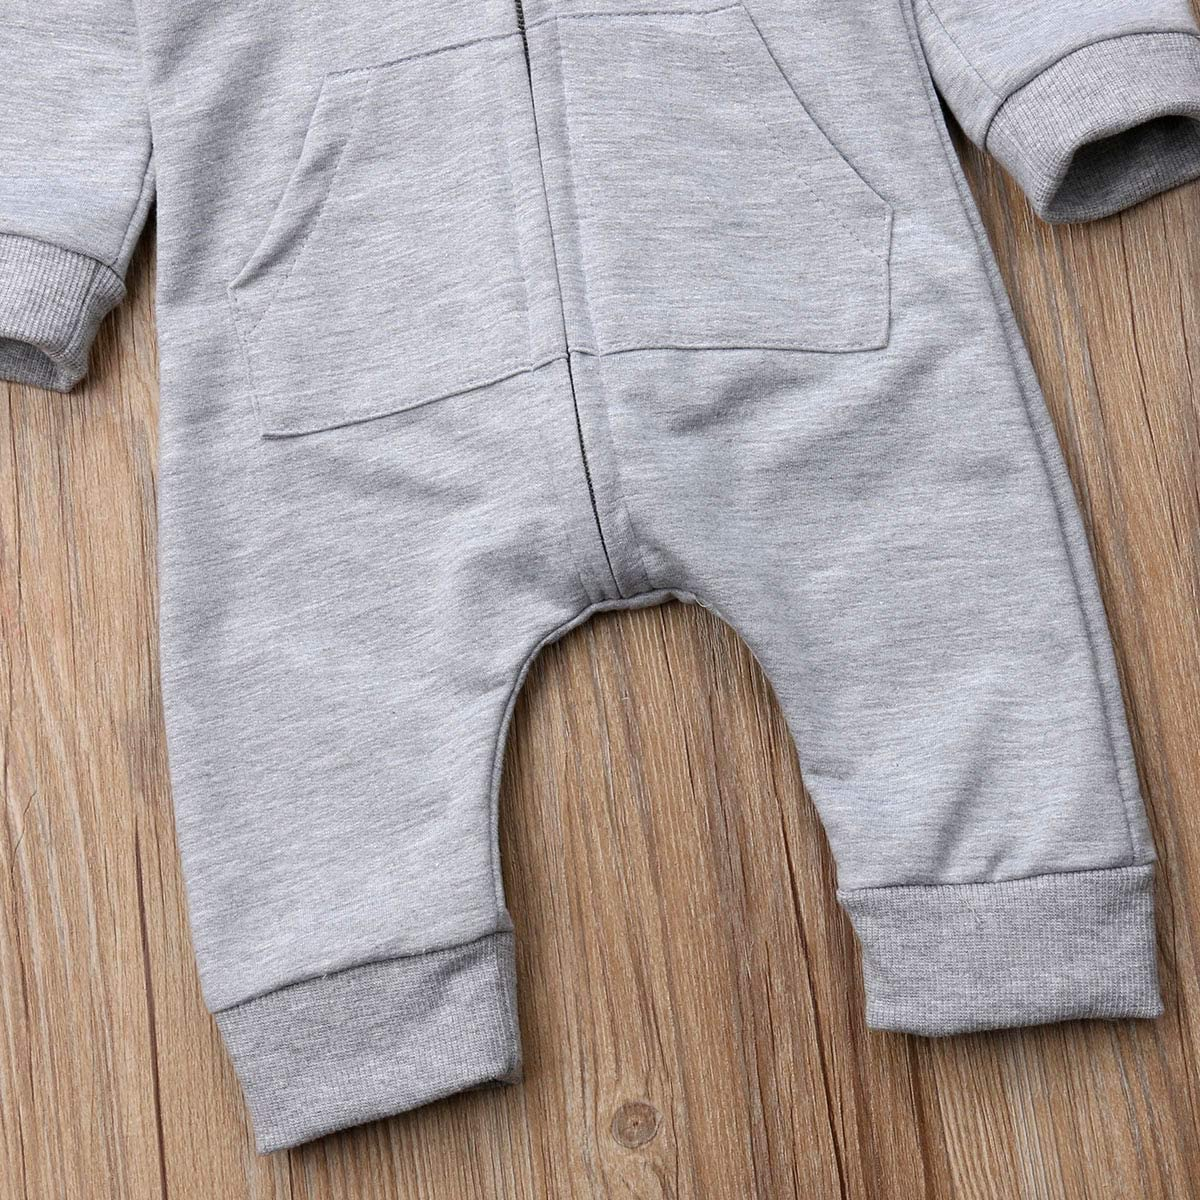 WakeUple Newborn Infant Unisex Baby Cartoon Shark Long Sleeve Hoodie Jumpsuit Bodysuit Romper Zipper Onesie Outfit